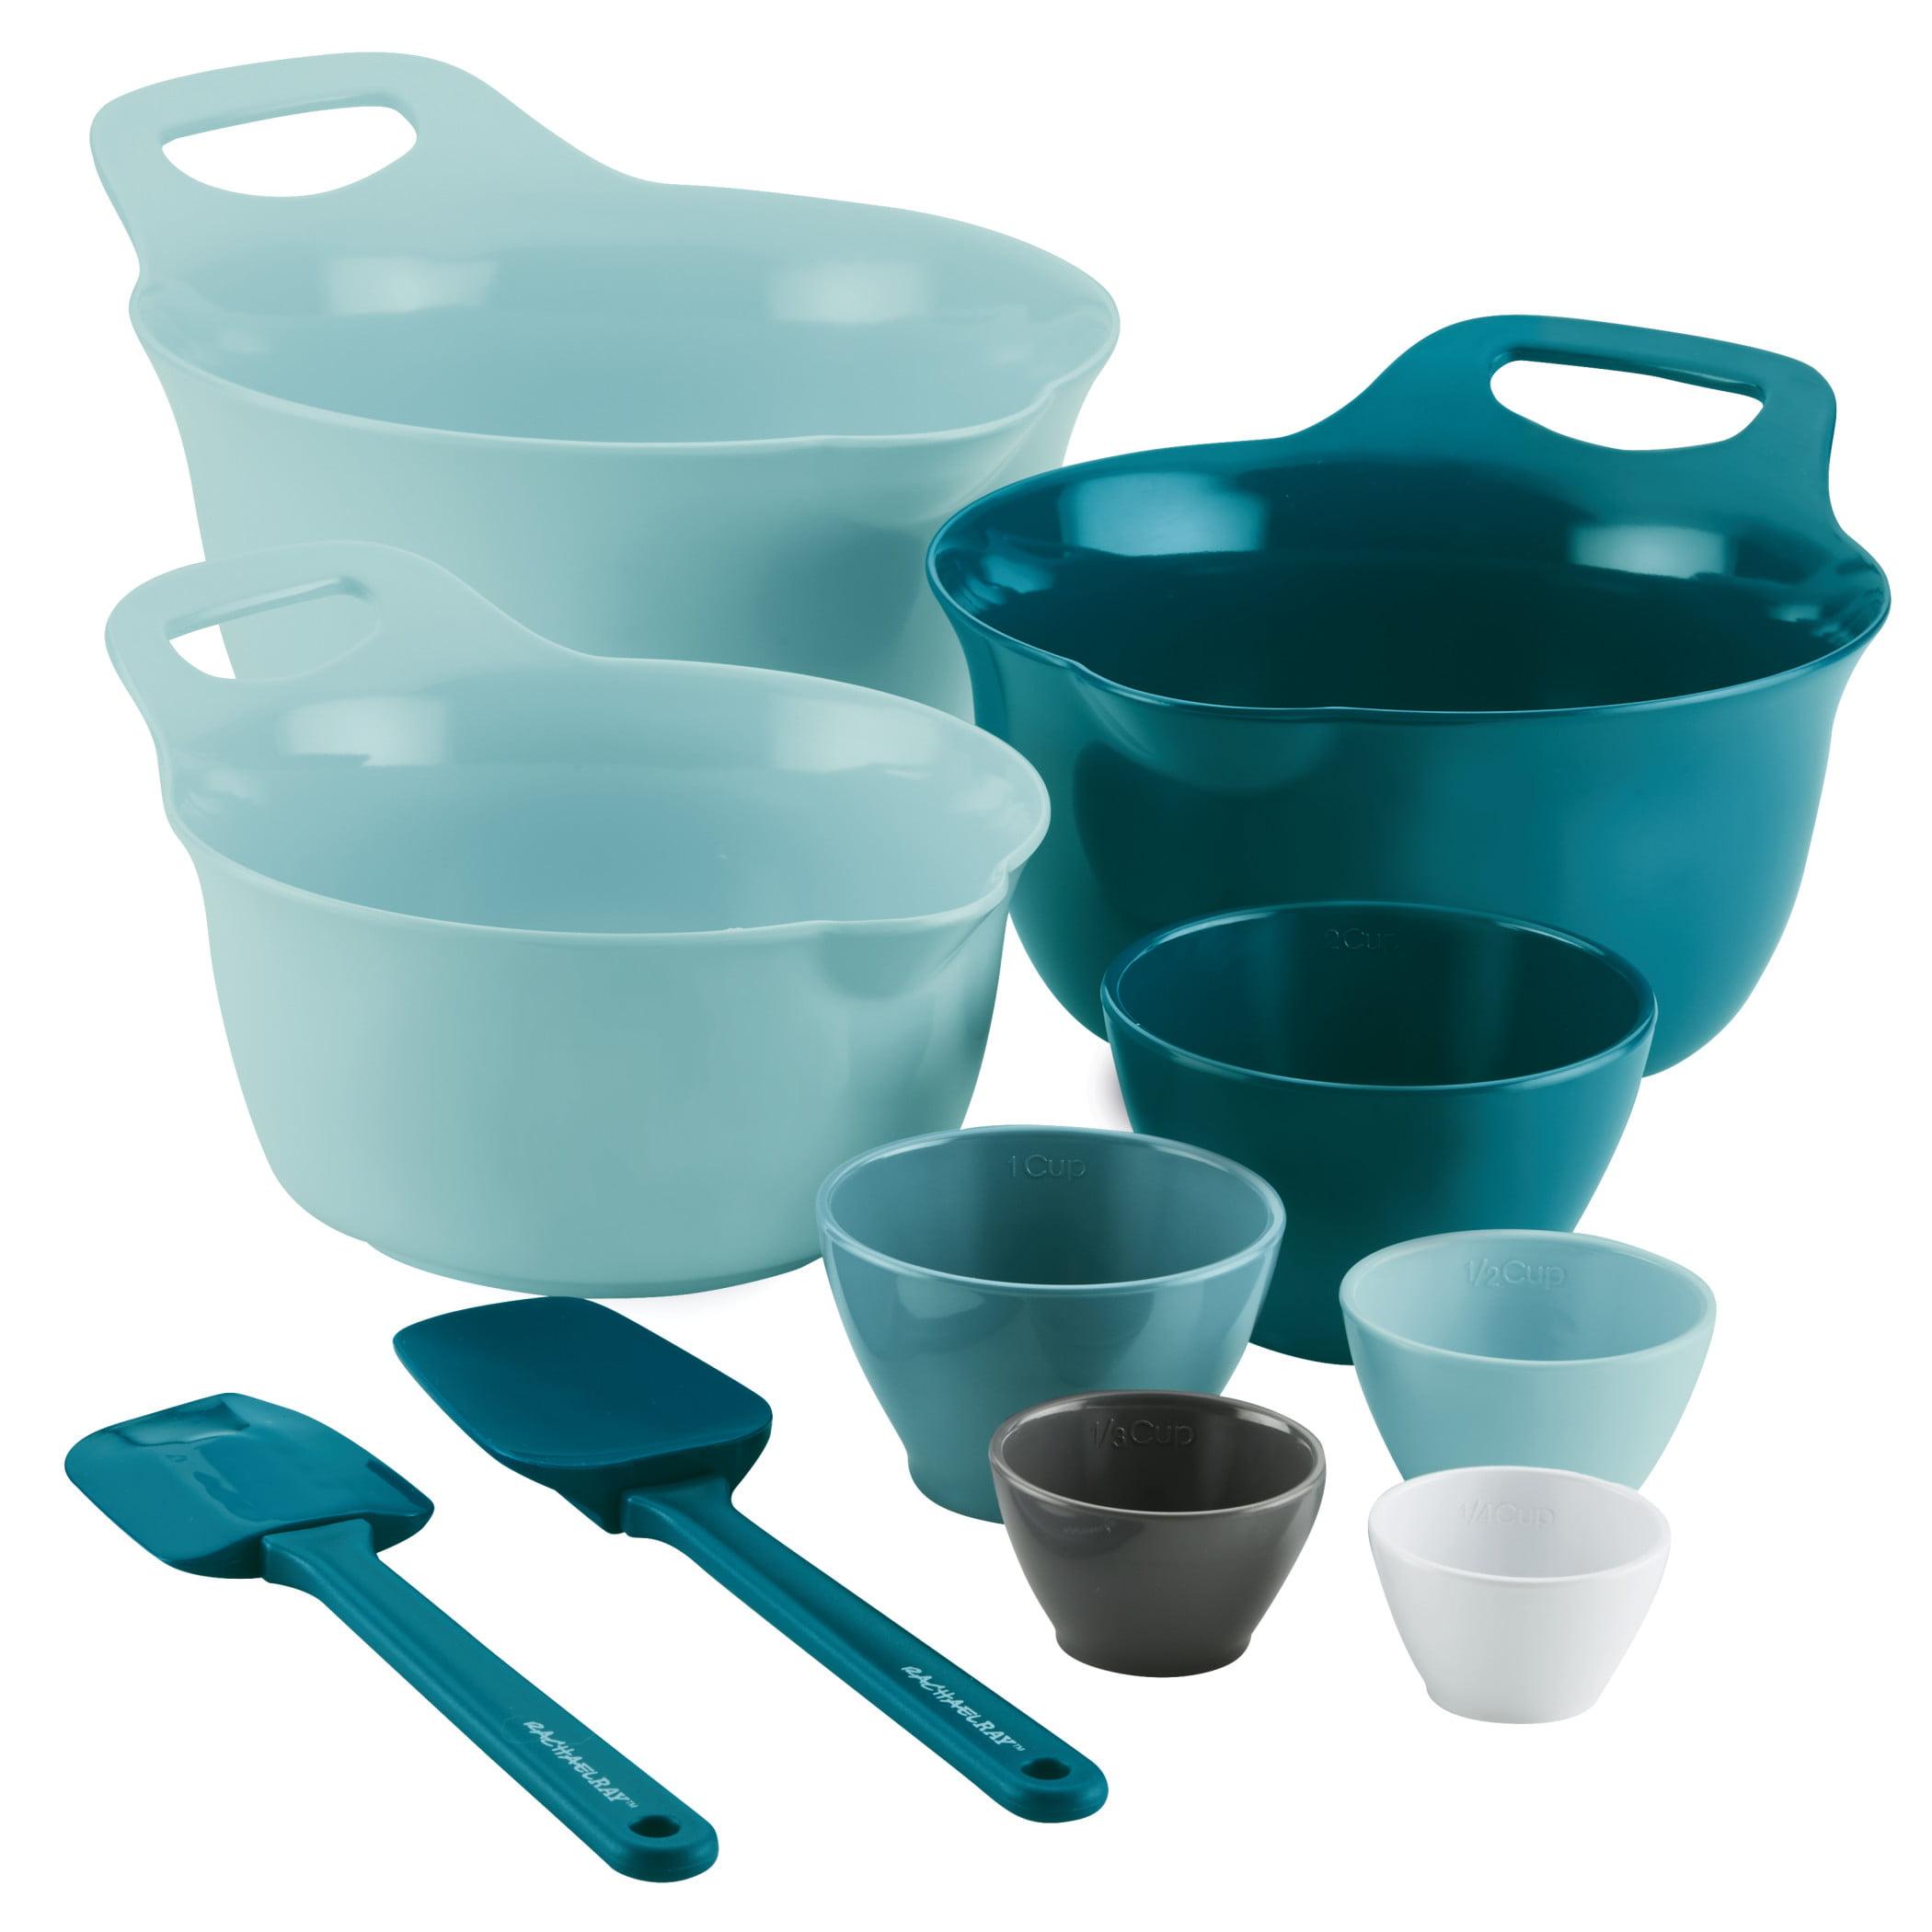 Rachael Ray 47813 Melamine Garbage Bowl Burgundy